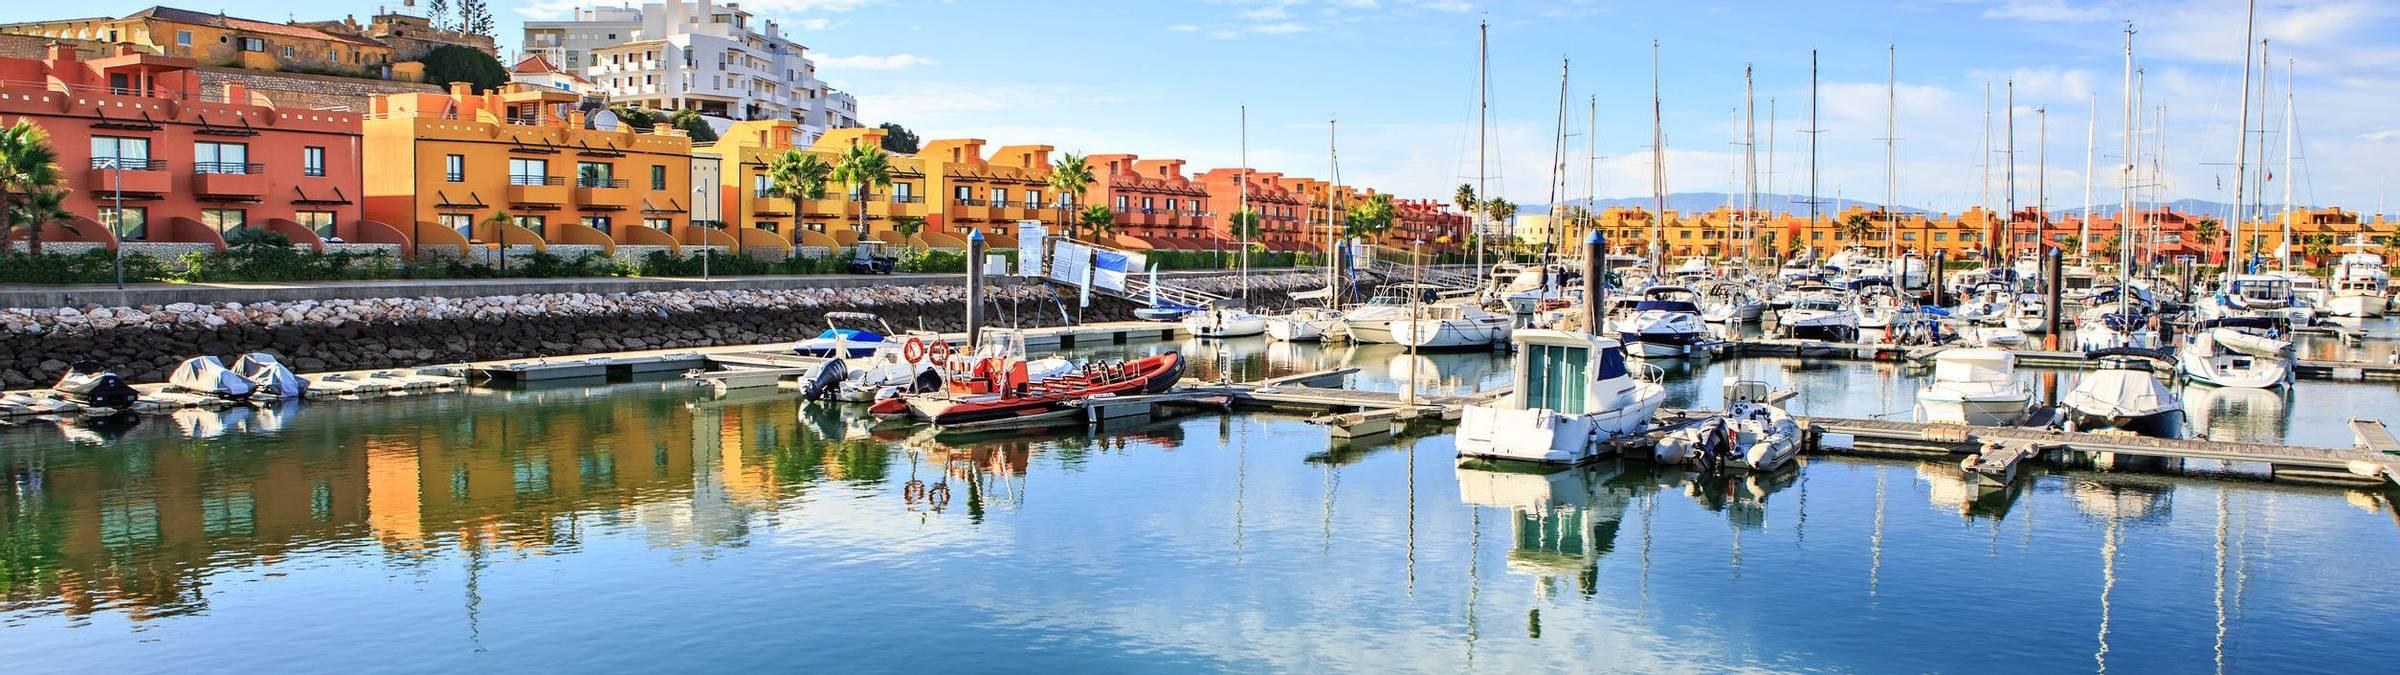 Marina de Portimao, Algarve, Southern Portugal. Credit: Variety Cruises